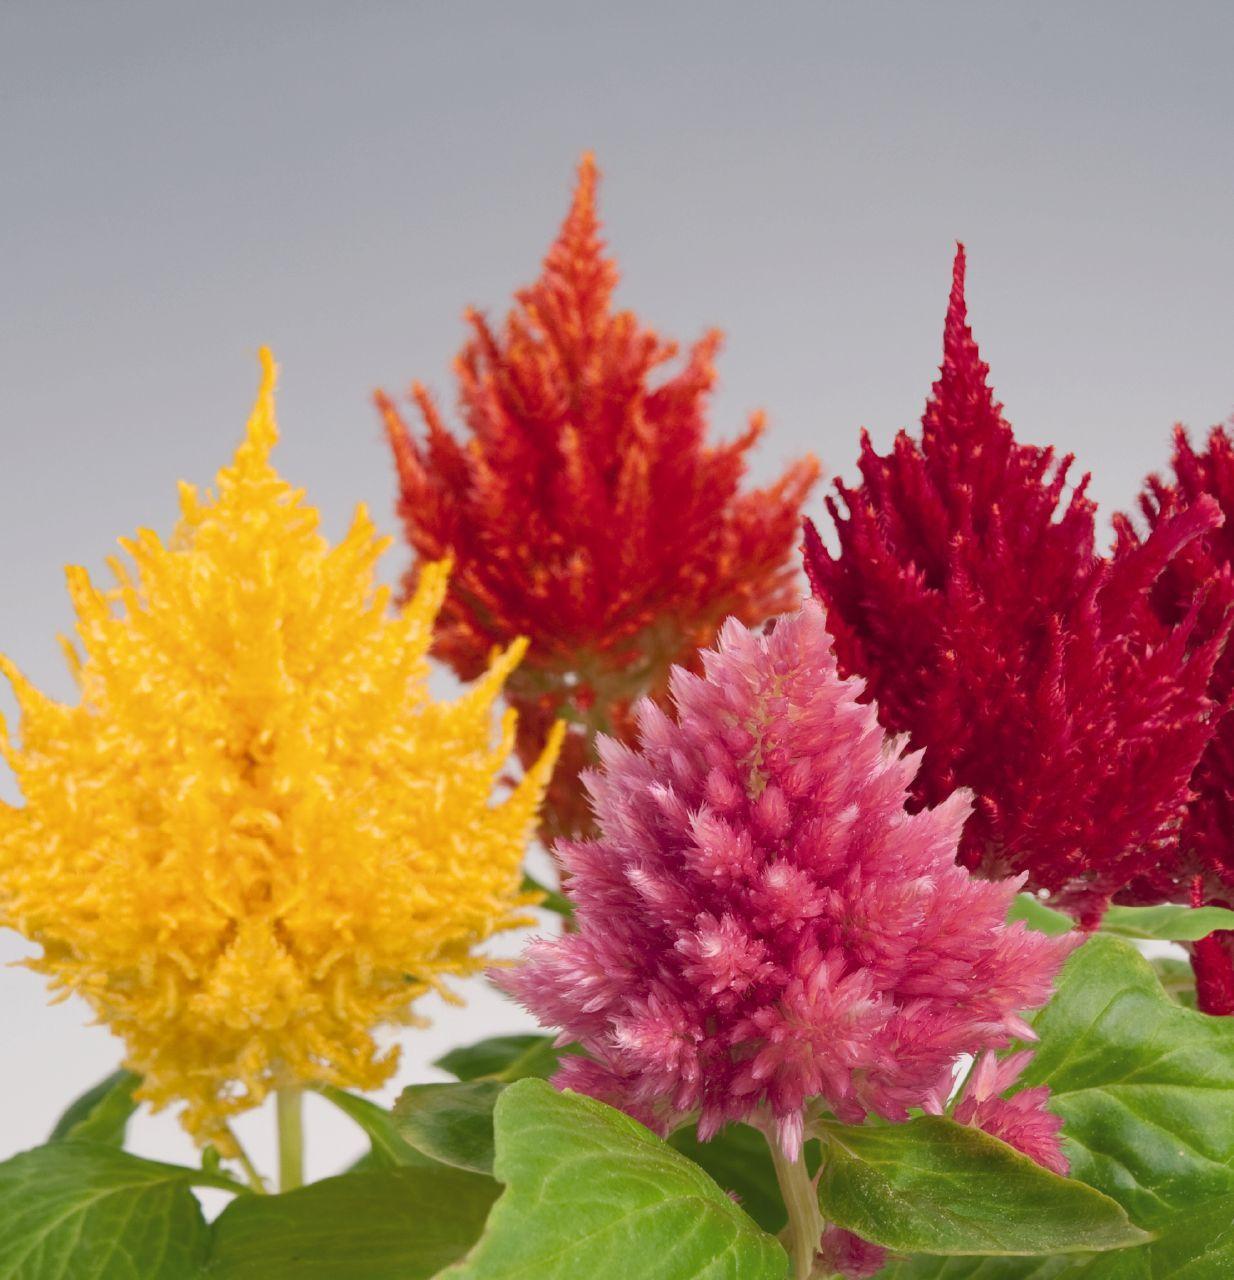 Celosia iekler flowers iekler pinterest flowers and photo of glorious mixture celosia flowers izmirmasajfo Image collections